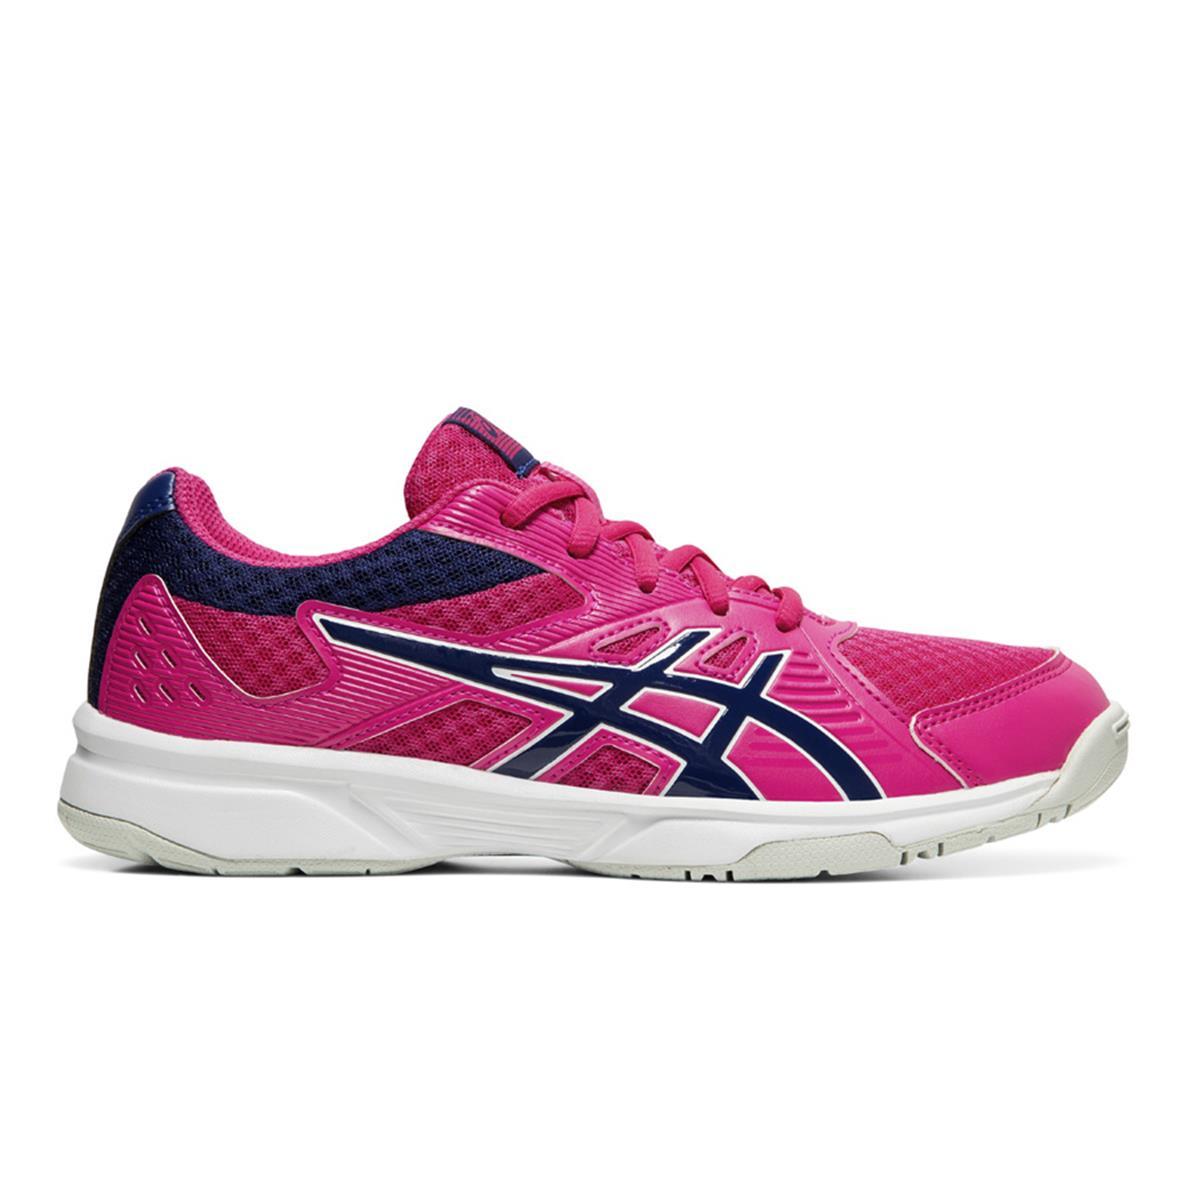 acheter populaire 93ddd 4fbc7 Asics Gel Upcourt 3 Womens Court Shoes (Fuchsia Purple-Diva Blue)    directsportsEshop.co.uk